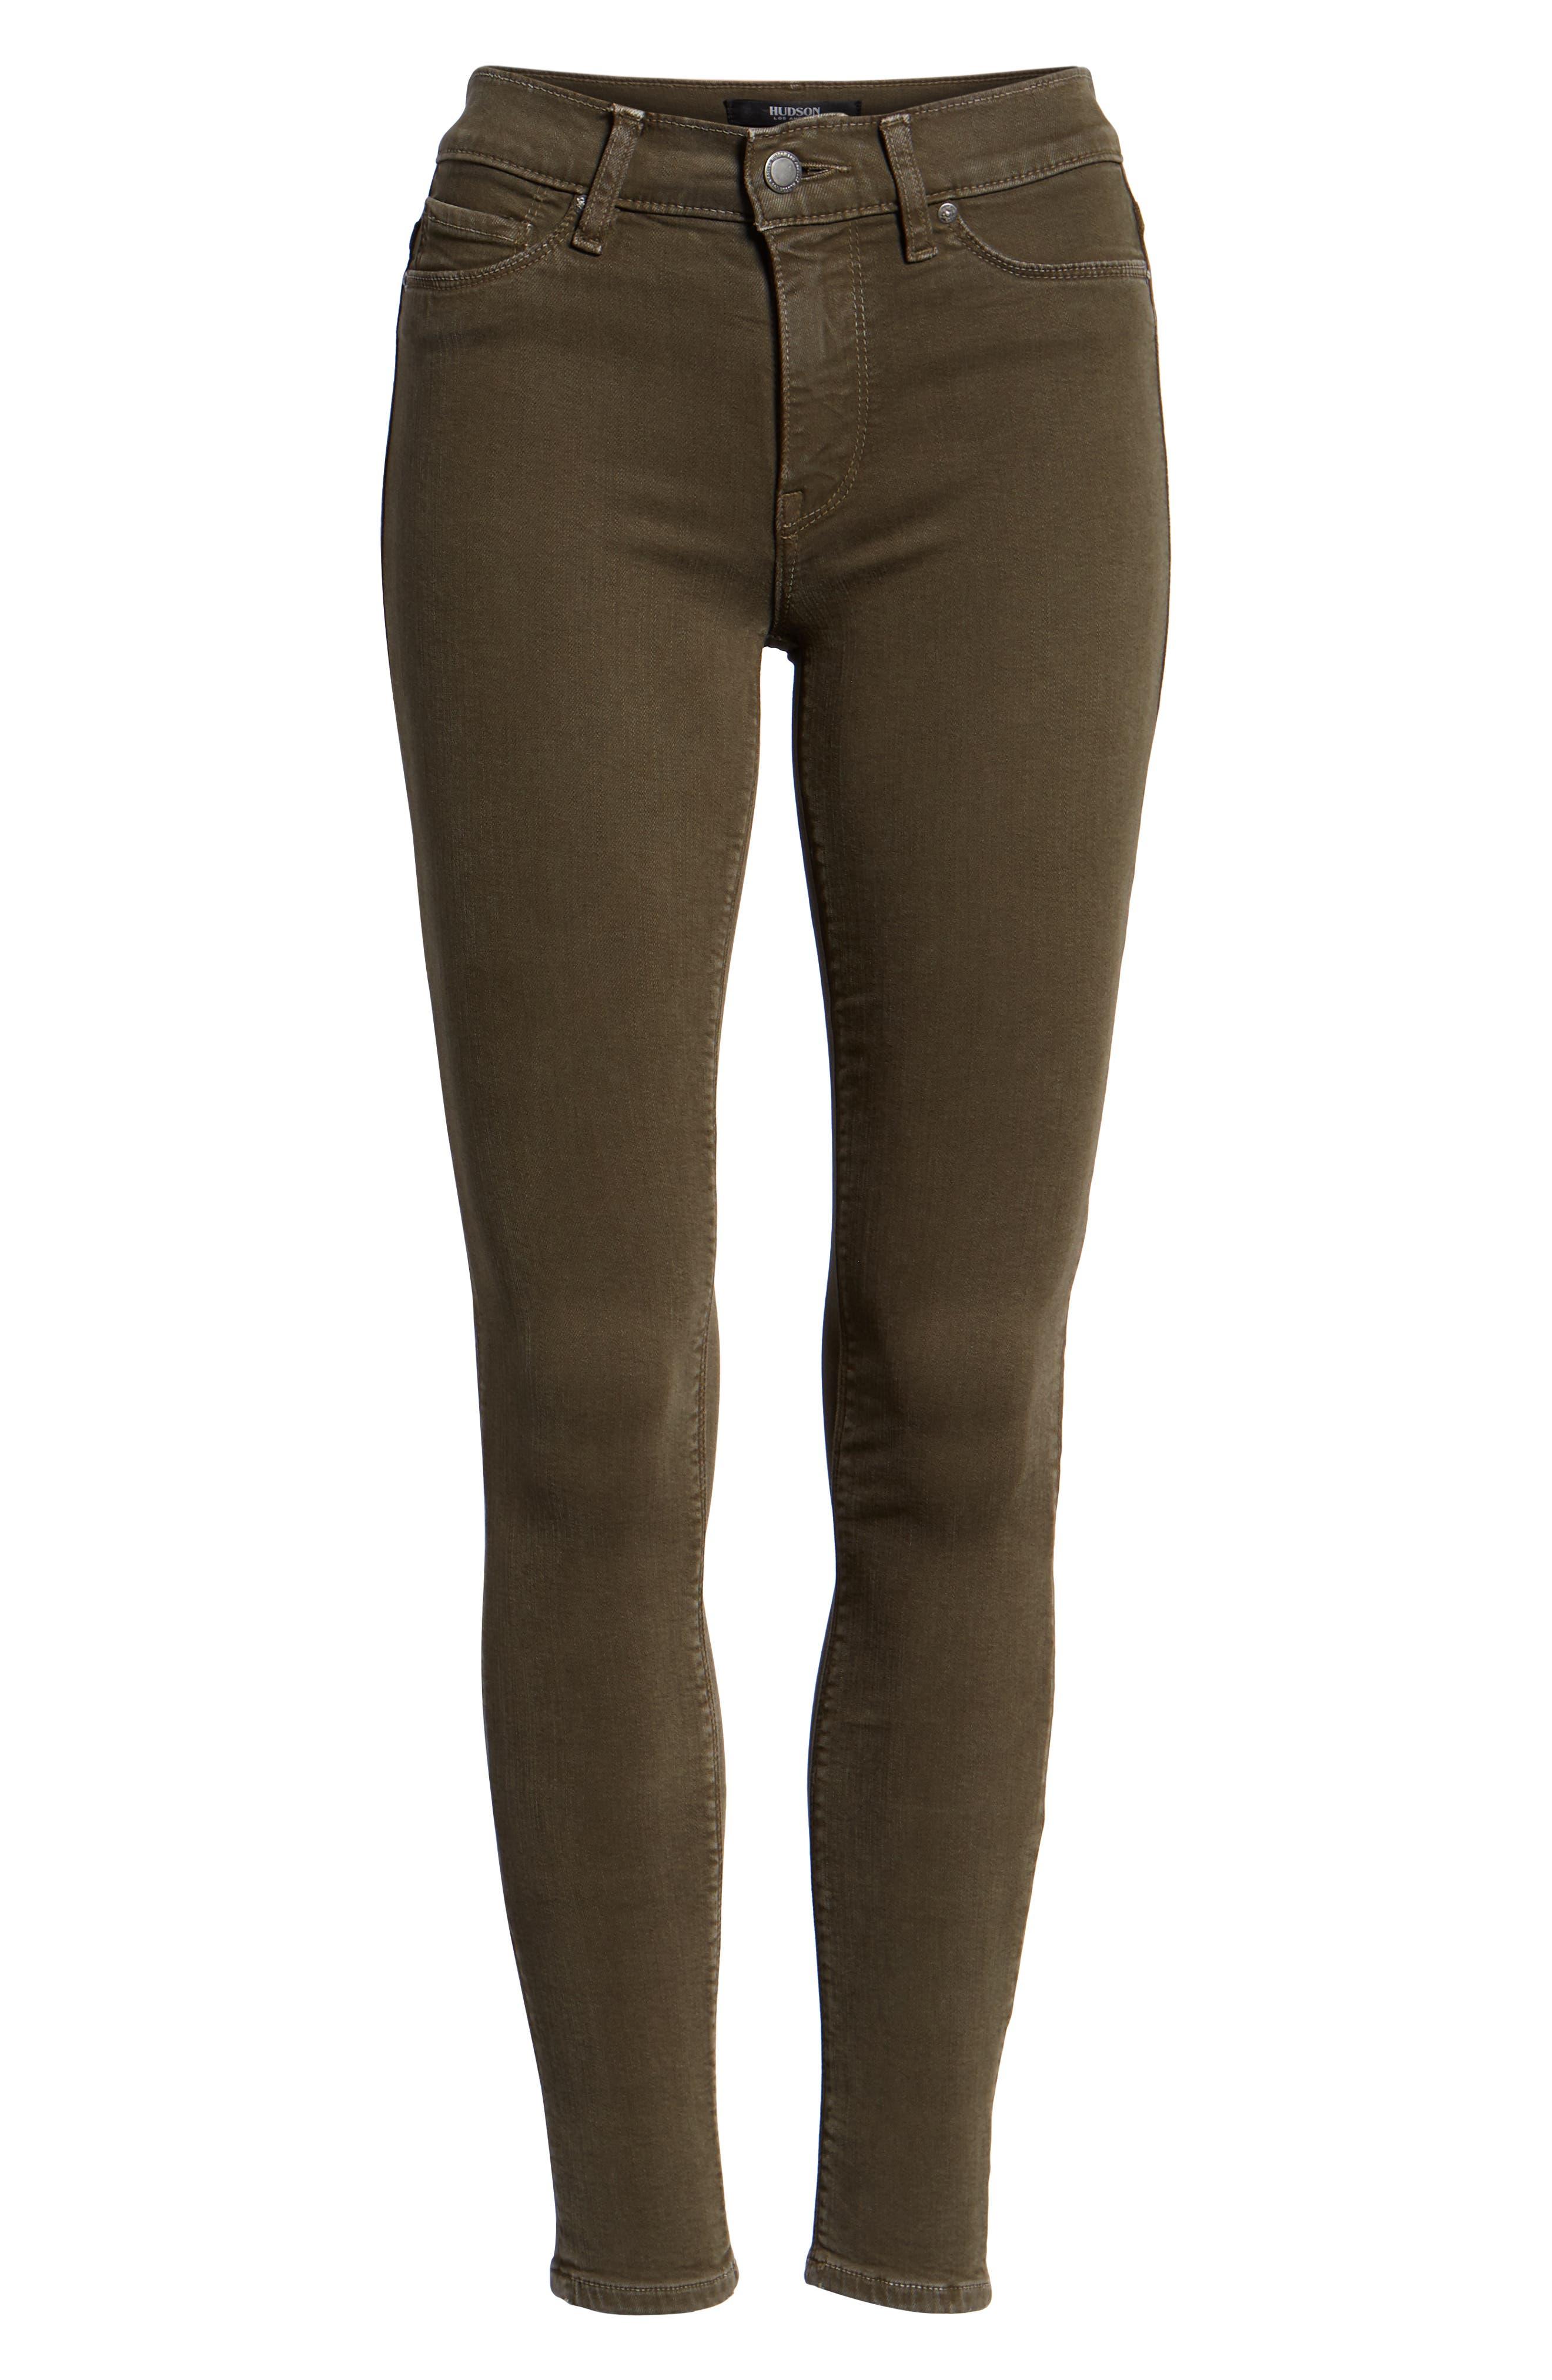 HudsonJeans Nico Super Skinny Jeans,                             Alternate thumbnail 7, color,                             DISTRESSED DARK FORESTER